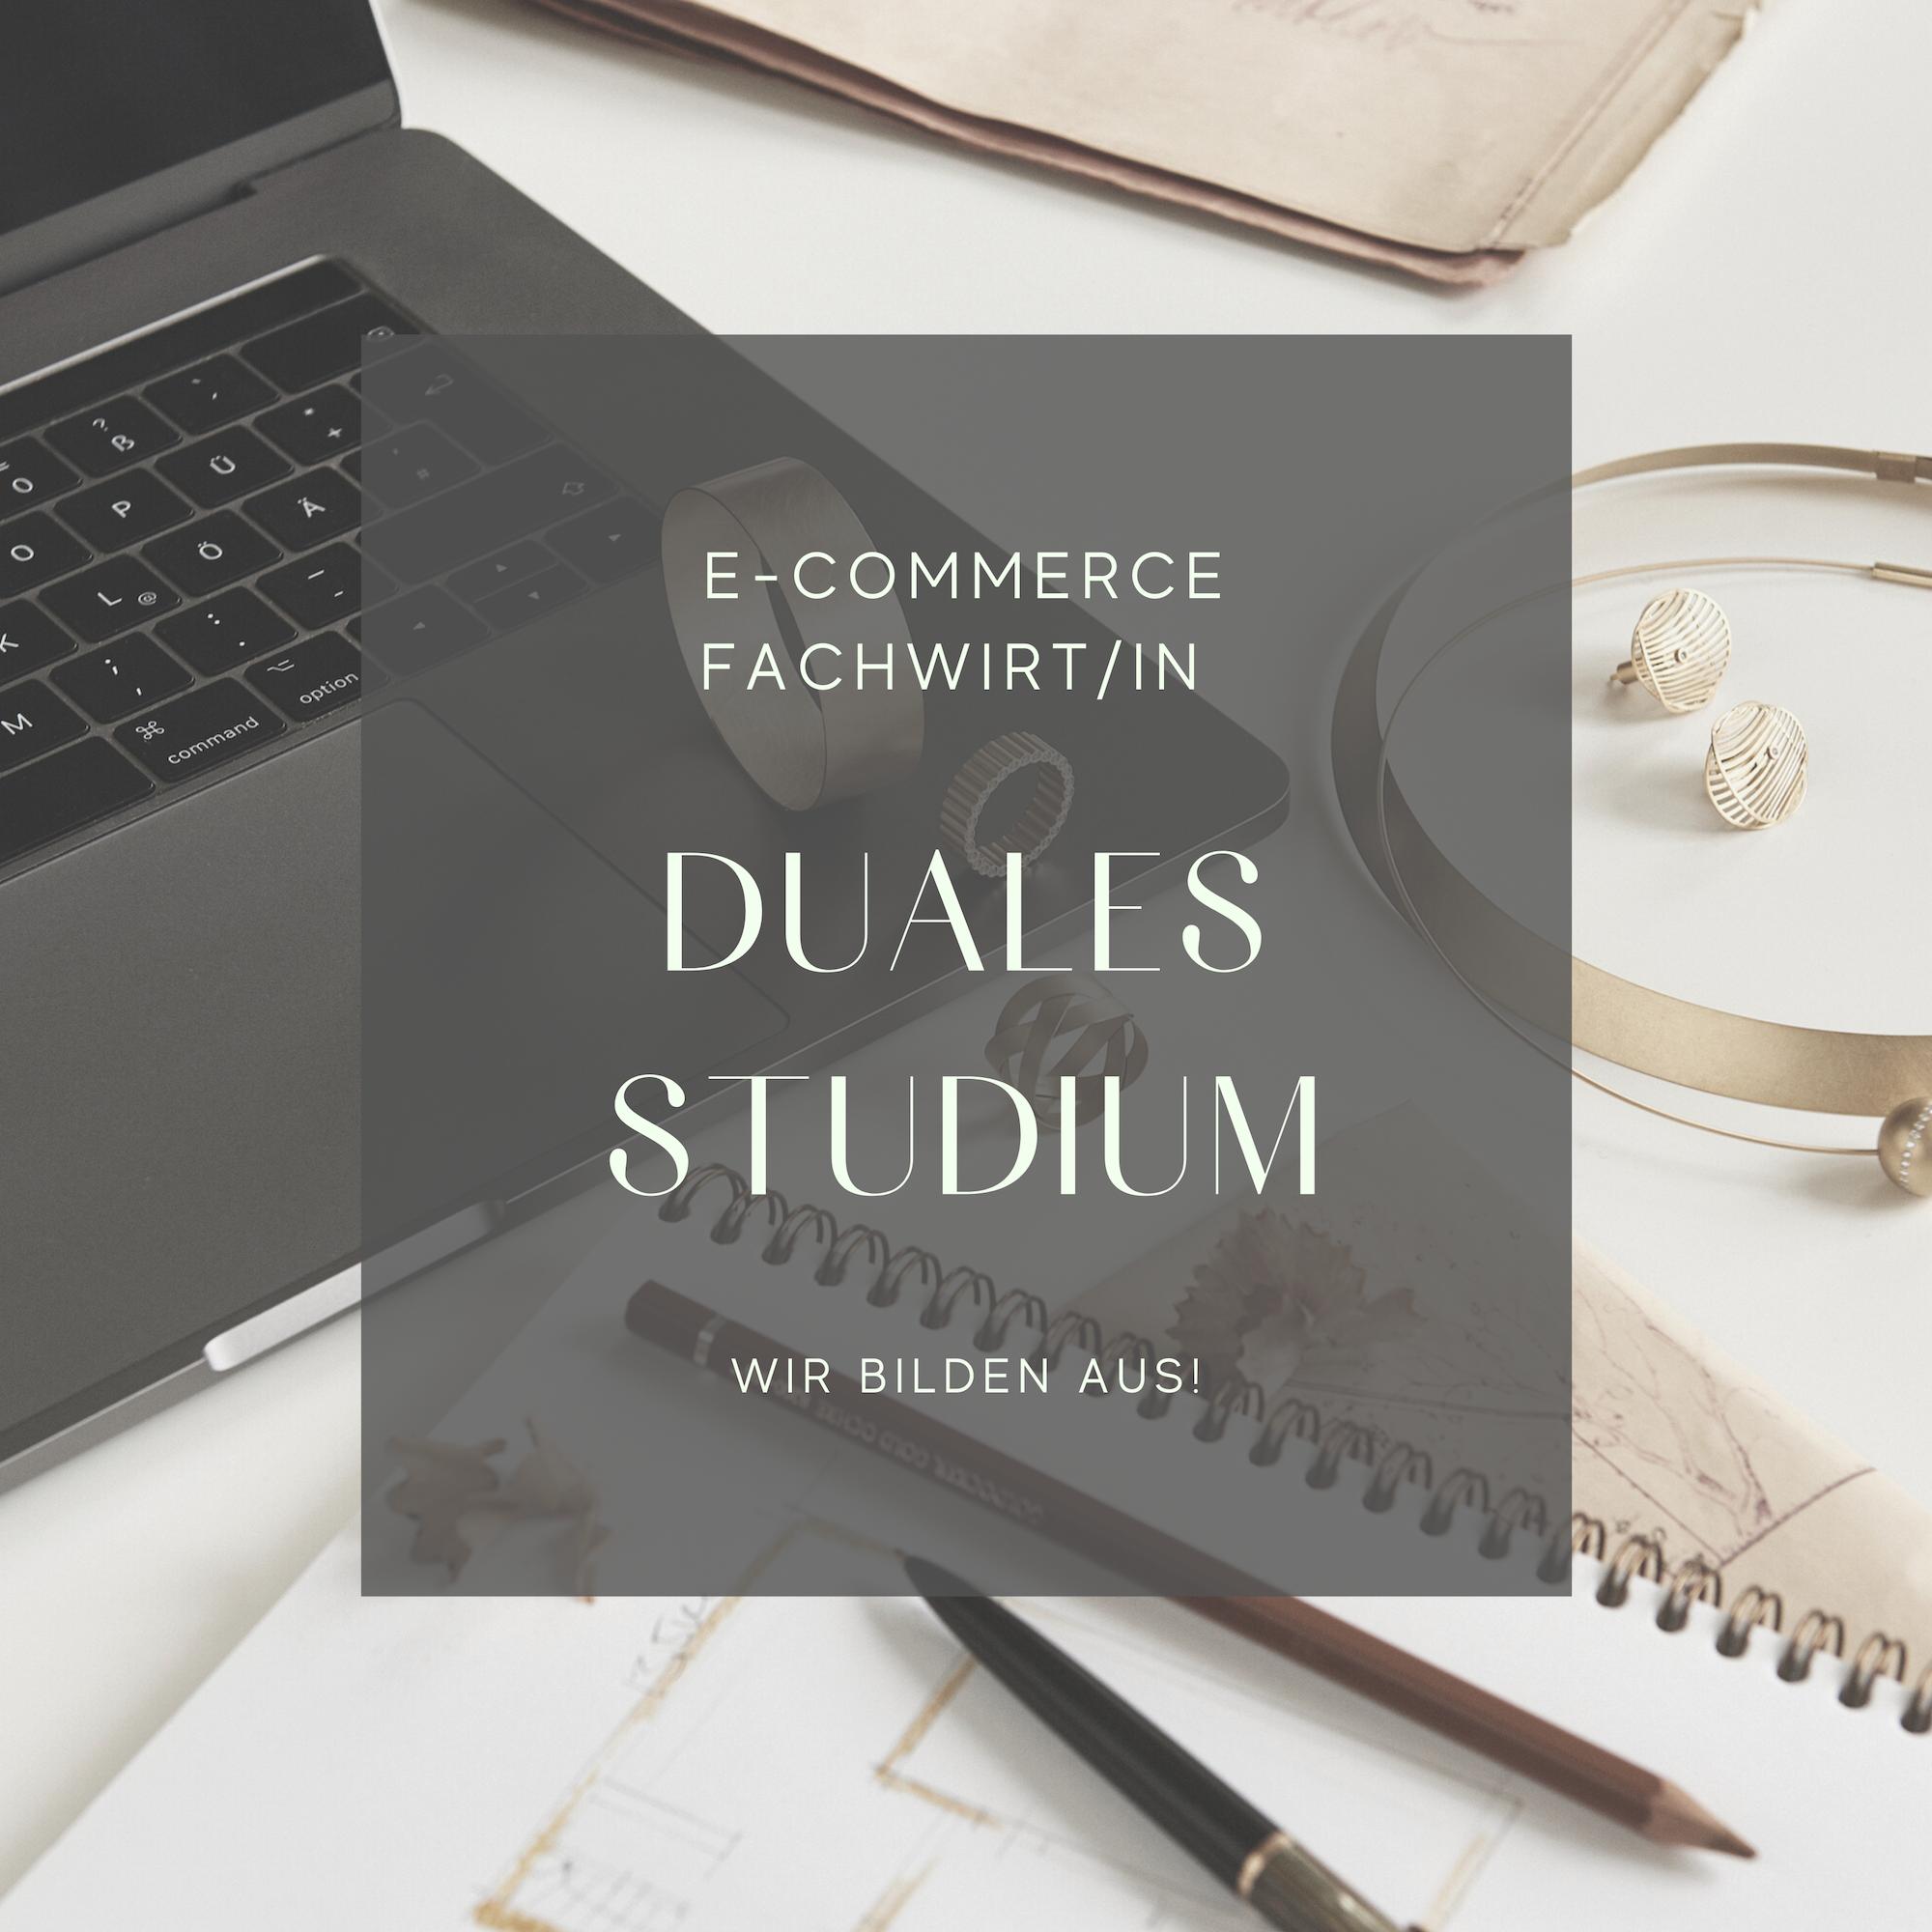 Duales Studium, Fachwirt E-Commerce